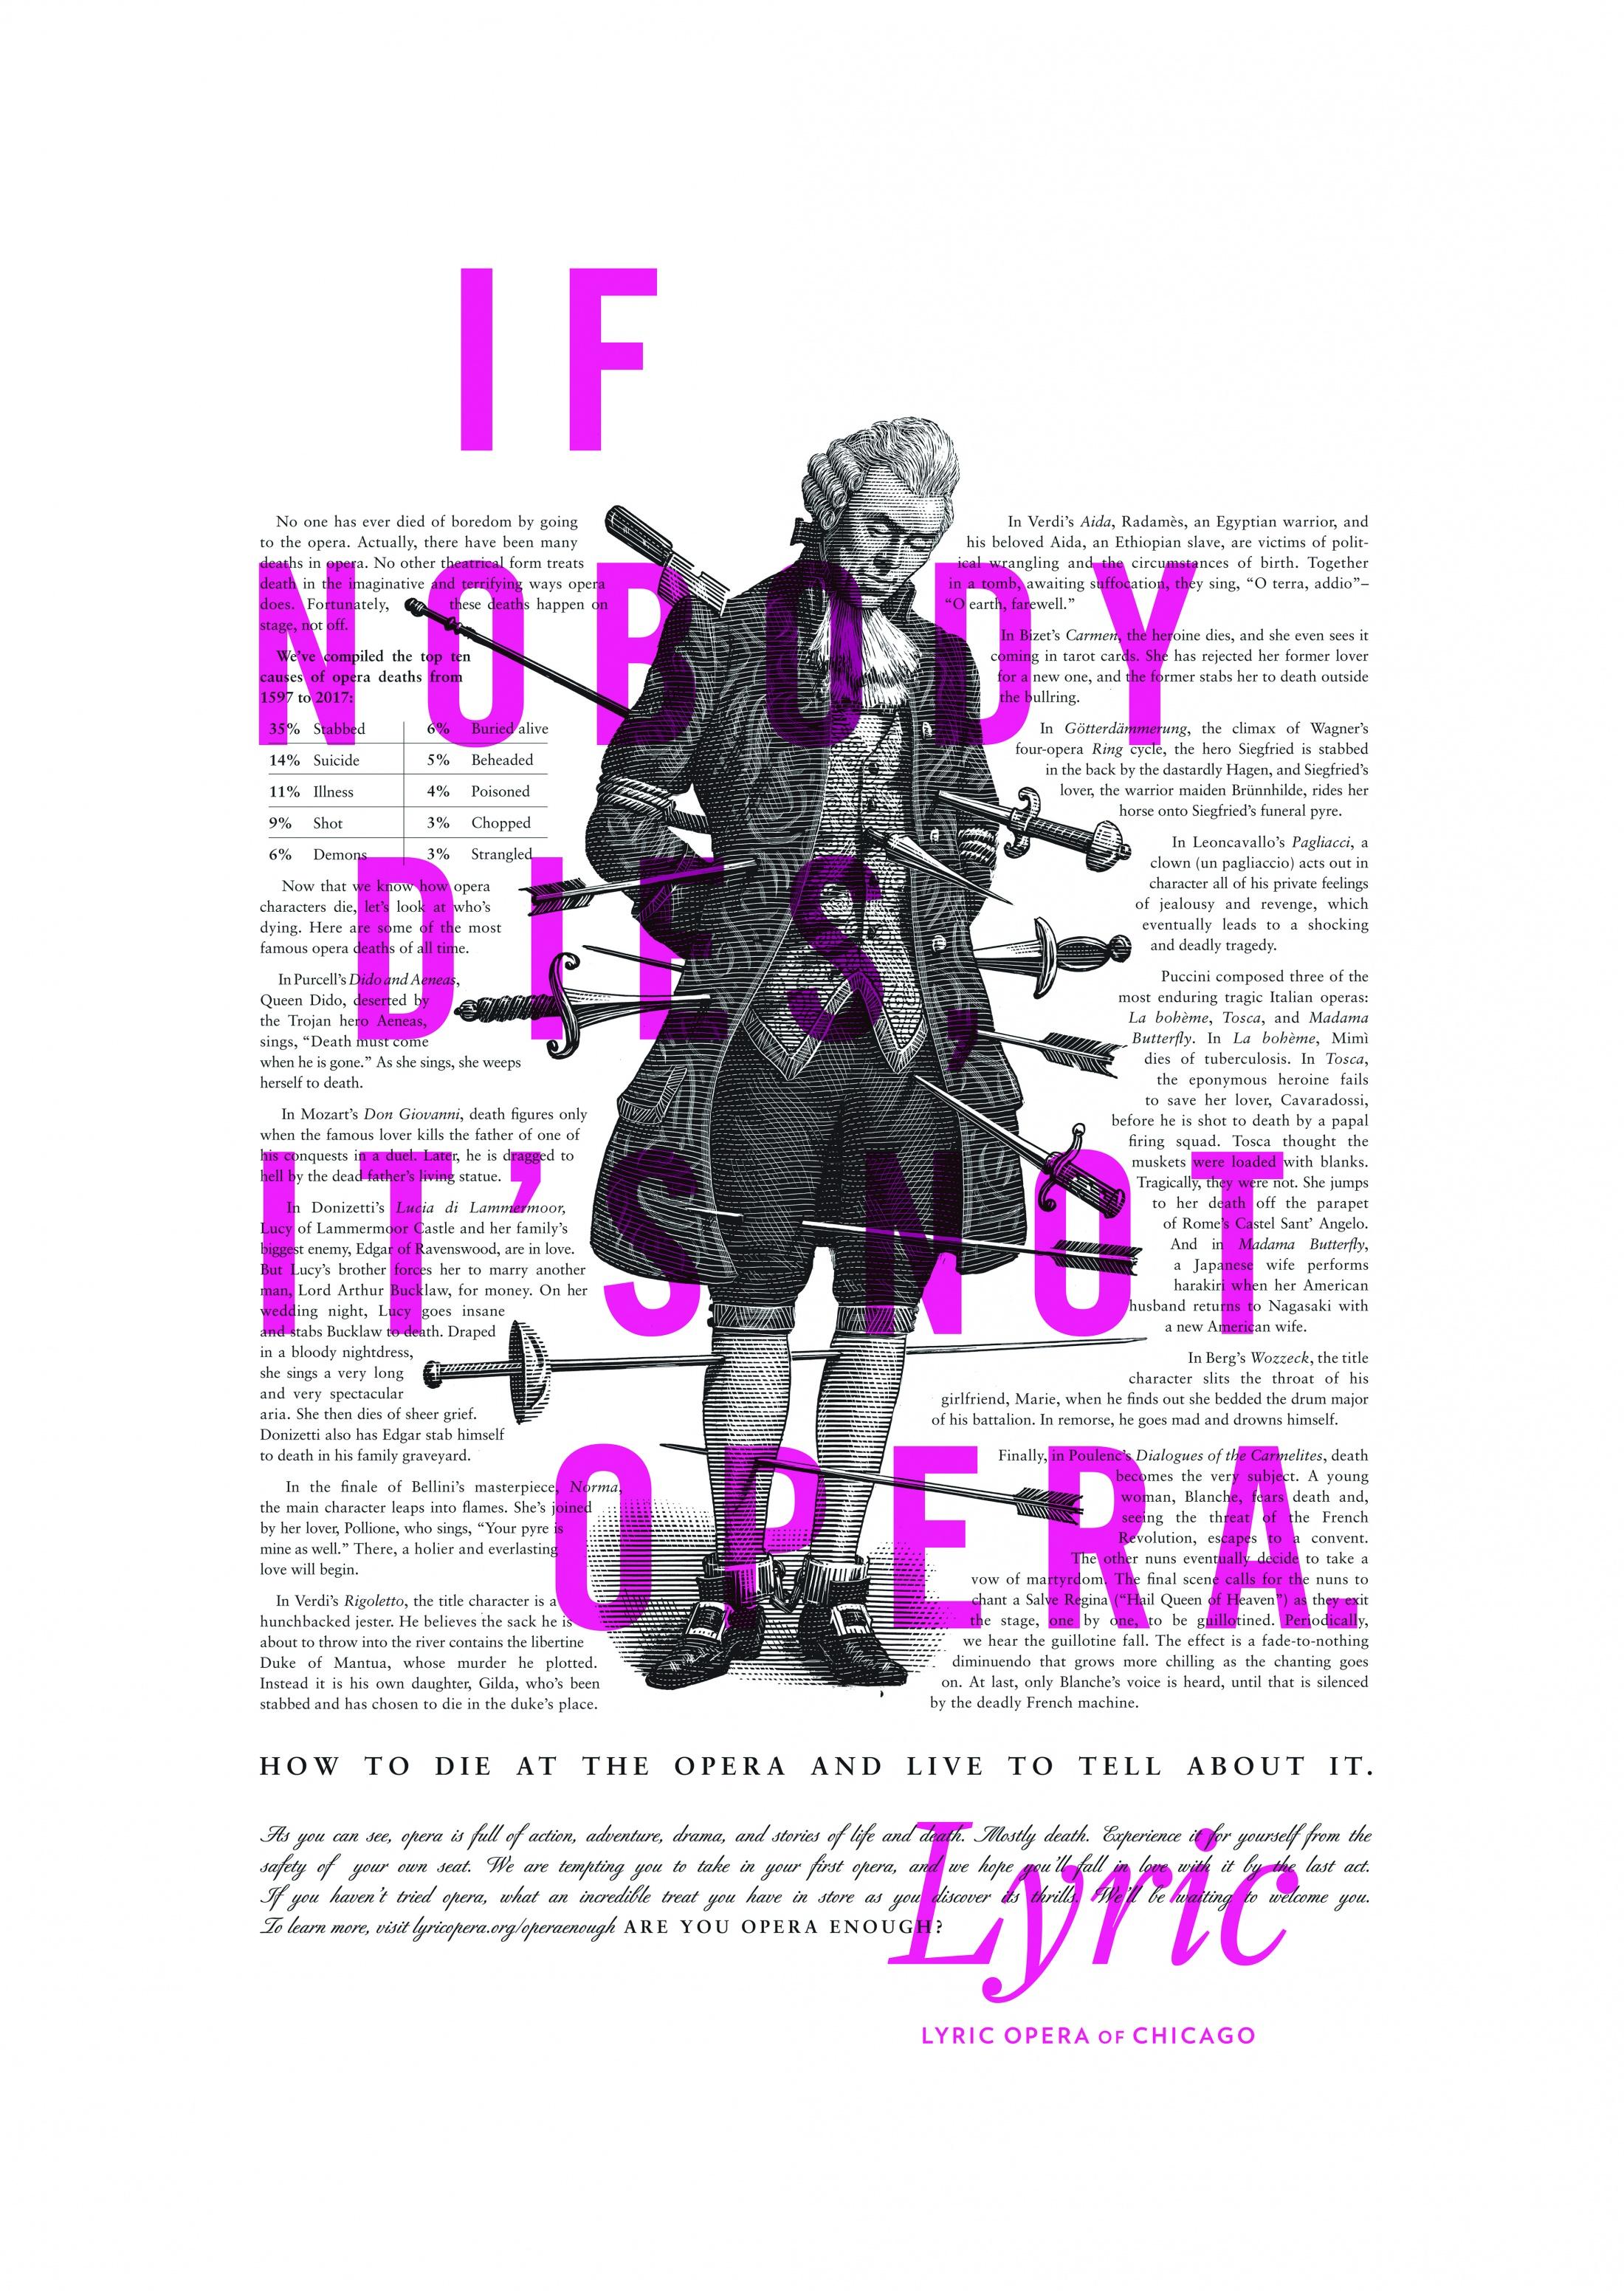 Thumbnail for Lyric Opera Print Campaign: Deaths